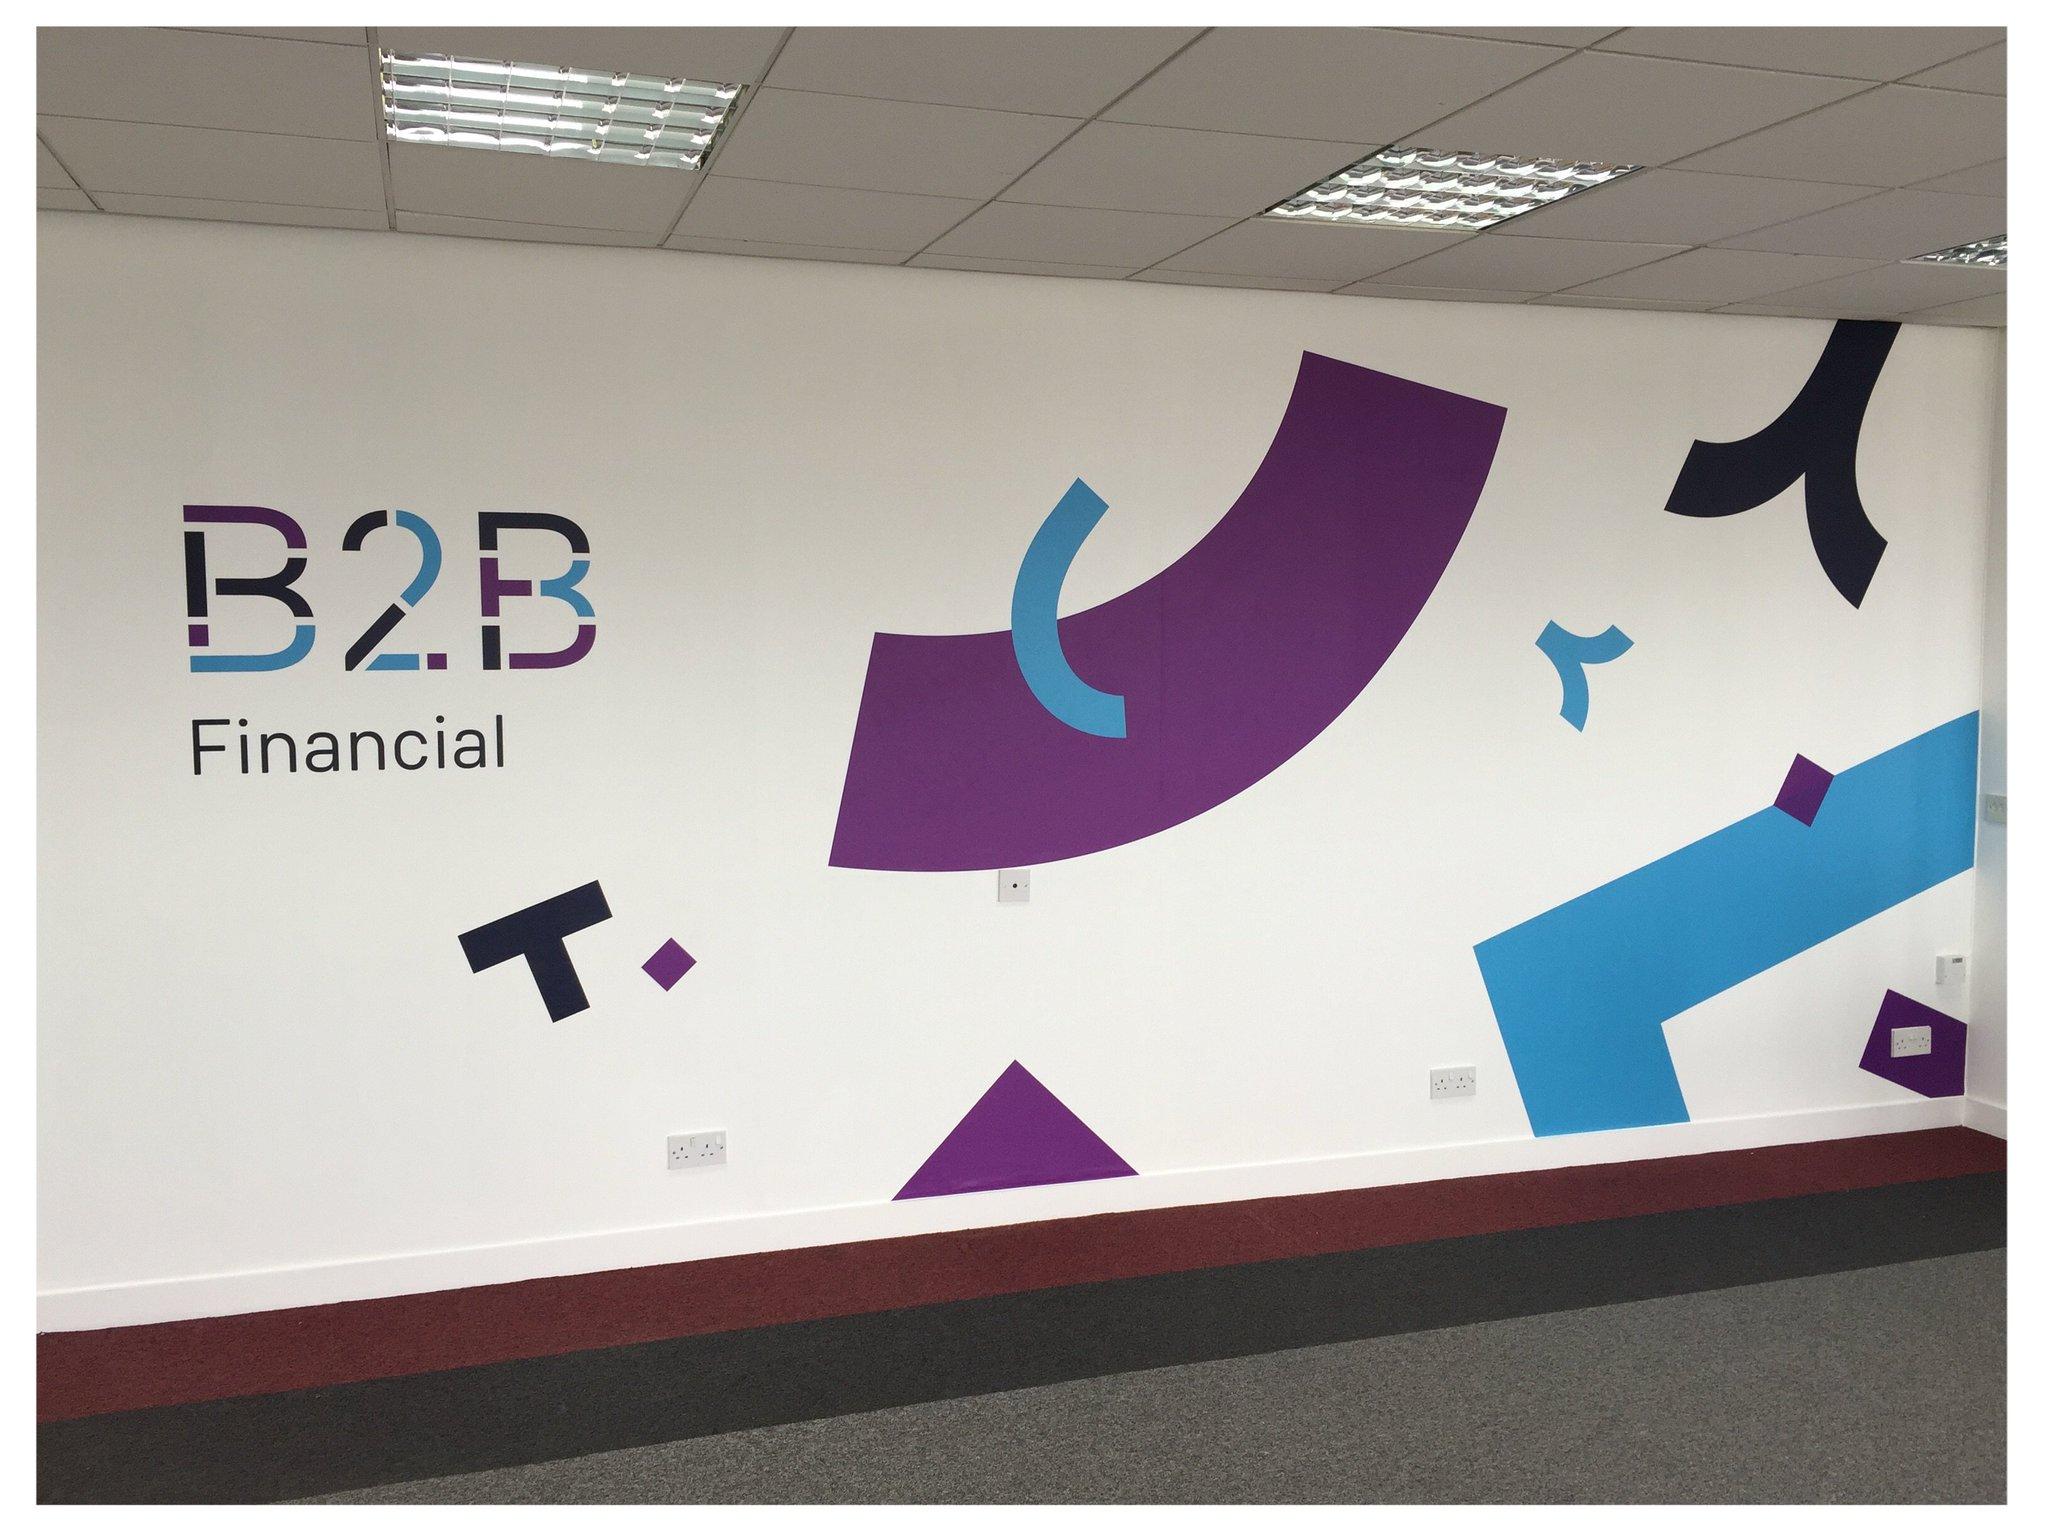 B2B-financial